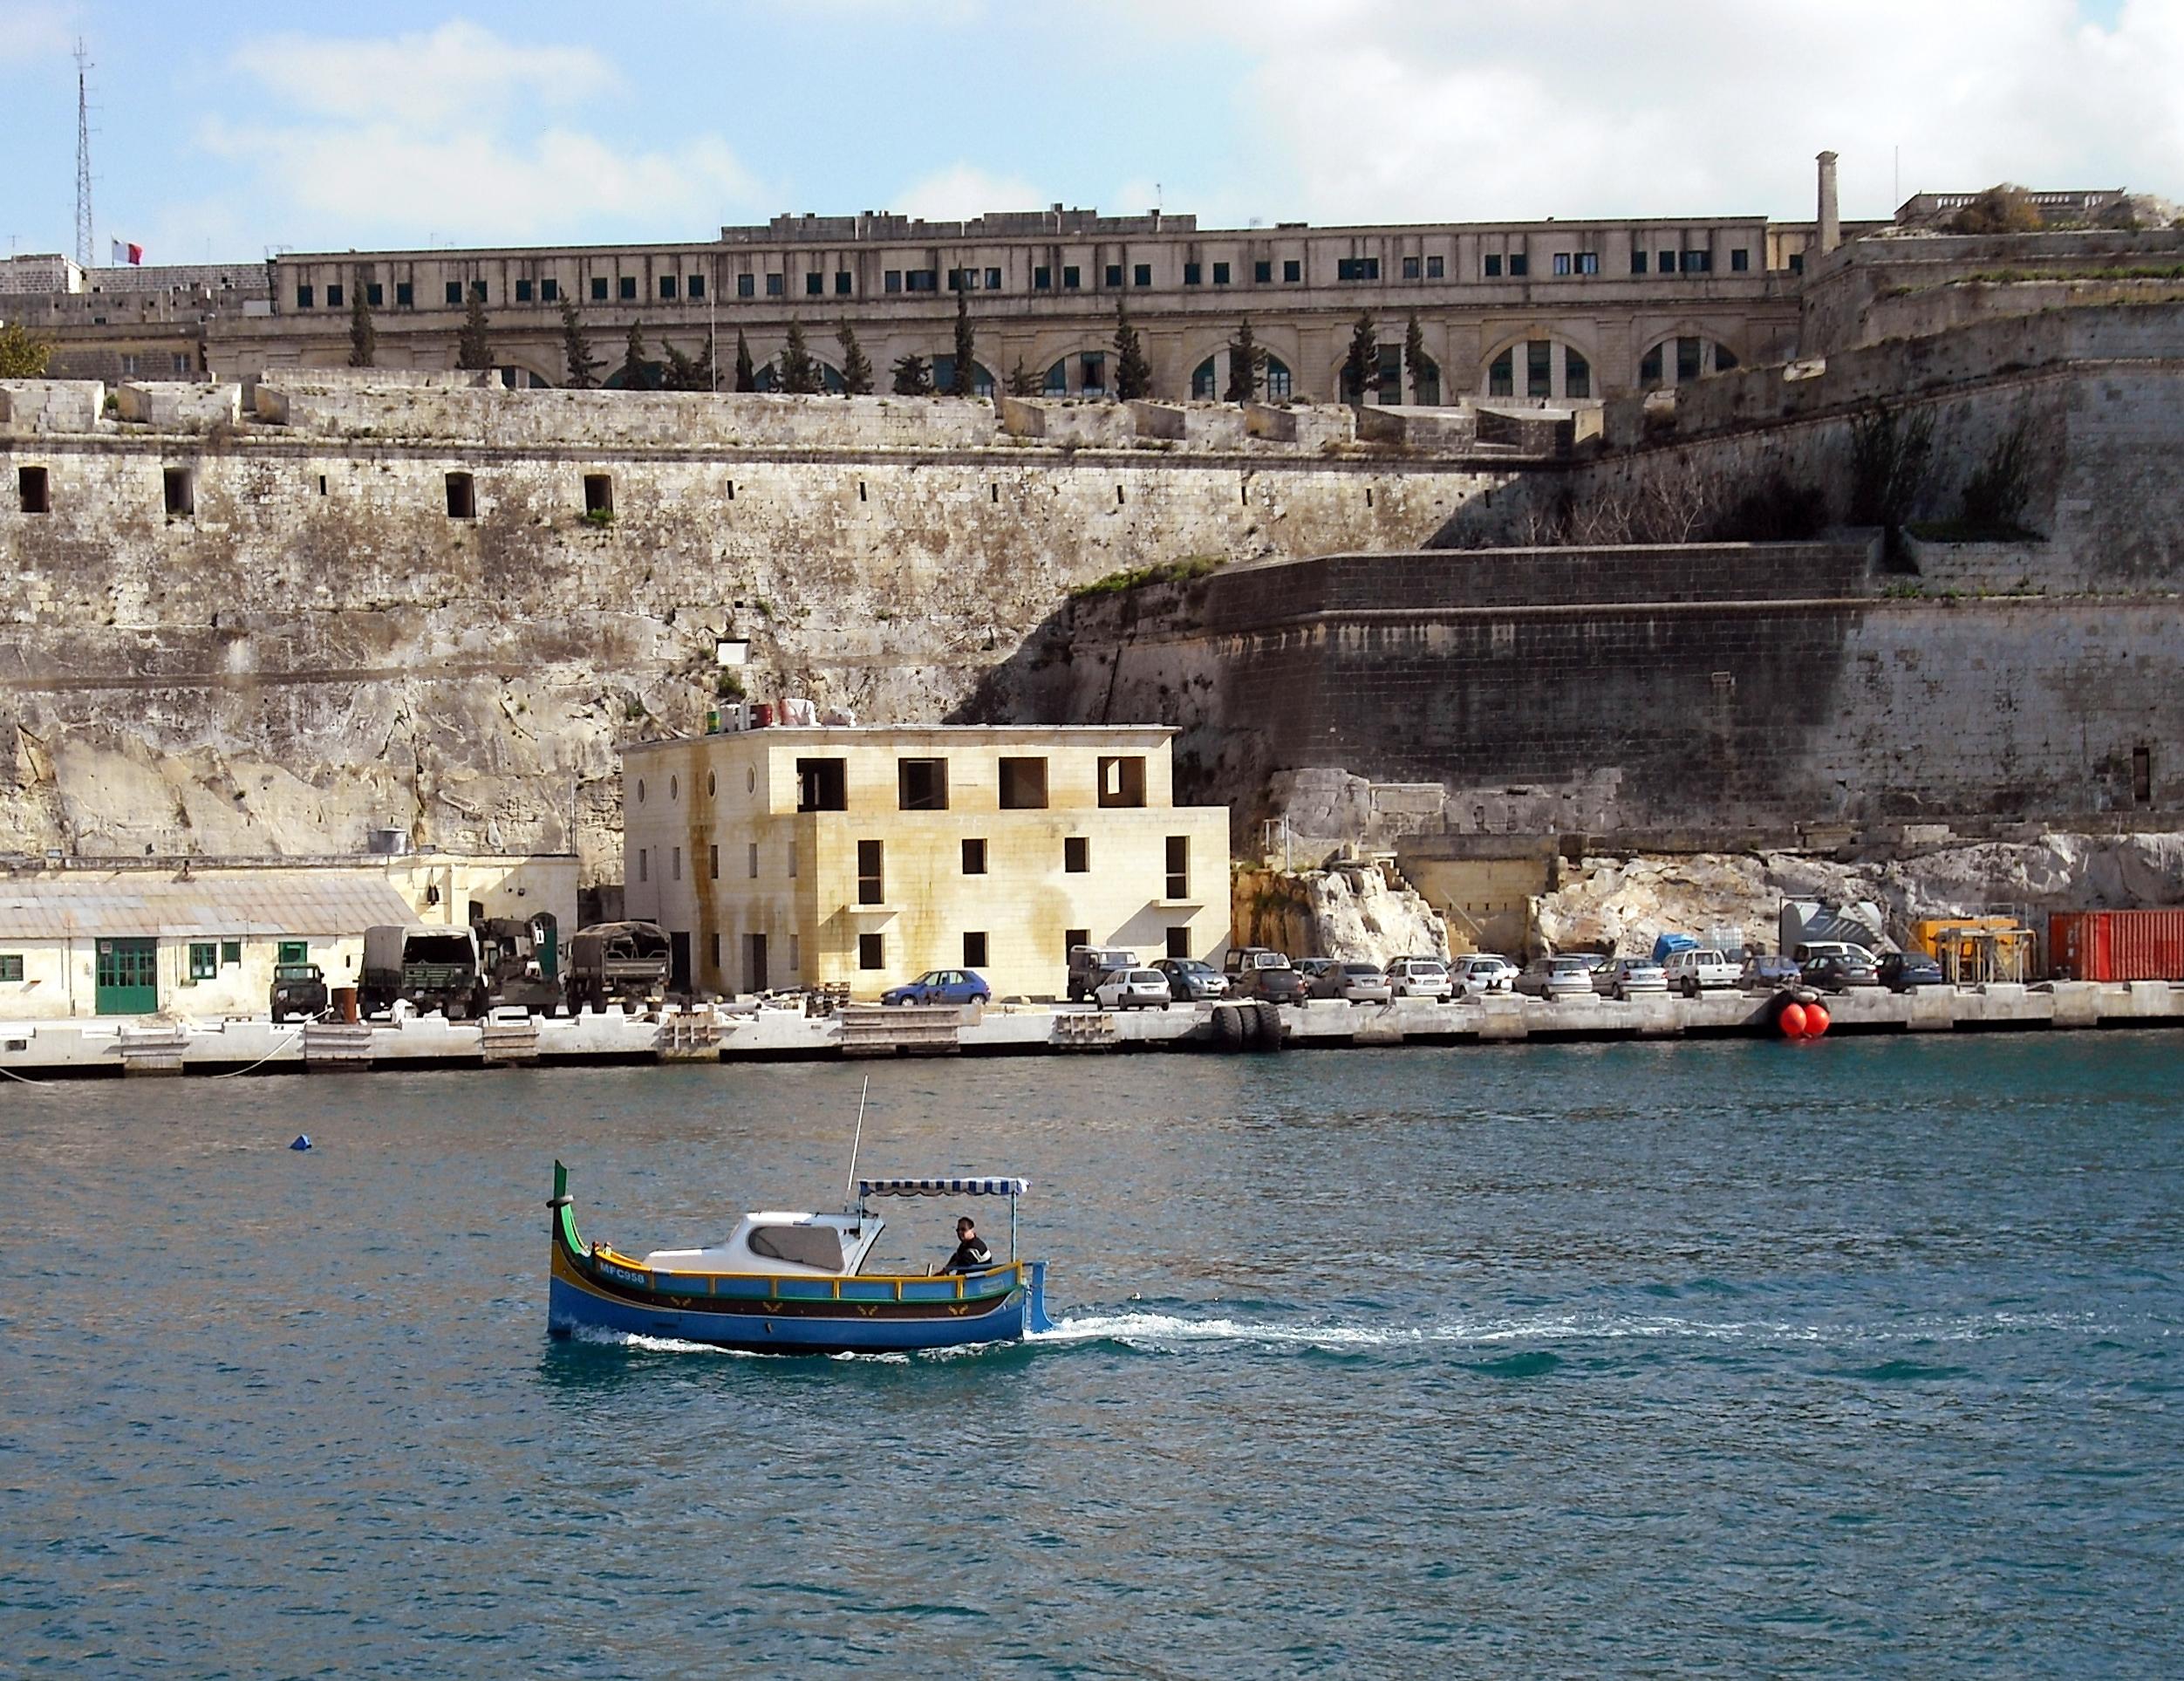 Maltese Fishing Boat, The Grand Harbour, Valletta, Malta.